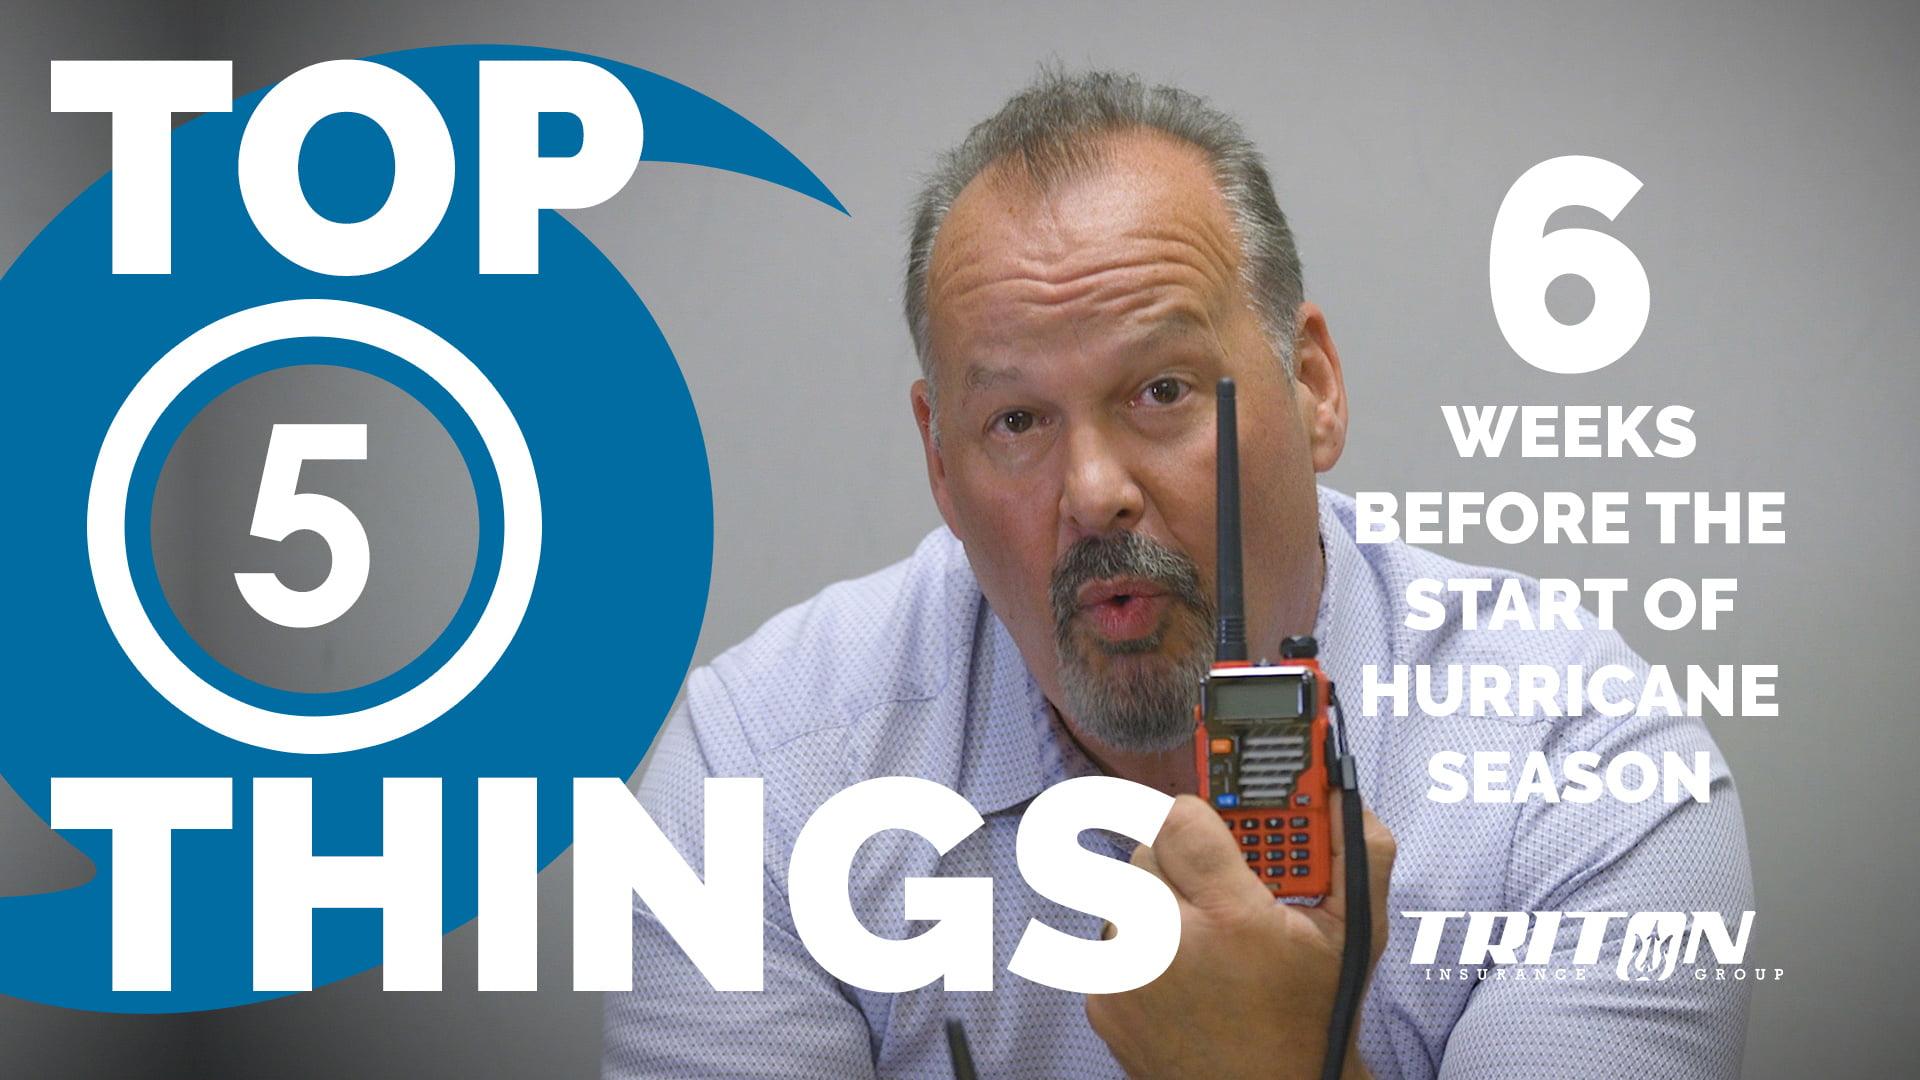 top-5-things-to-do-now-6-weeks-before-hurricane-season